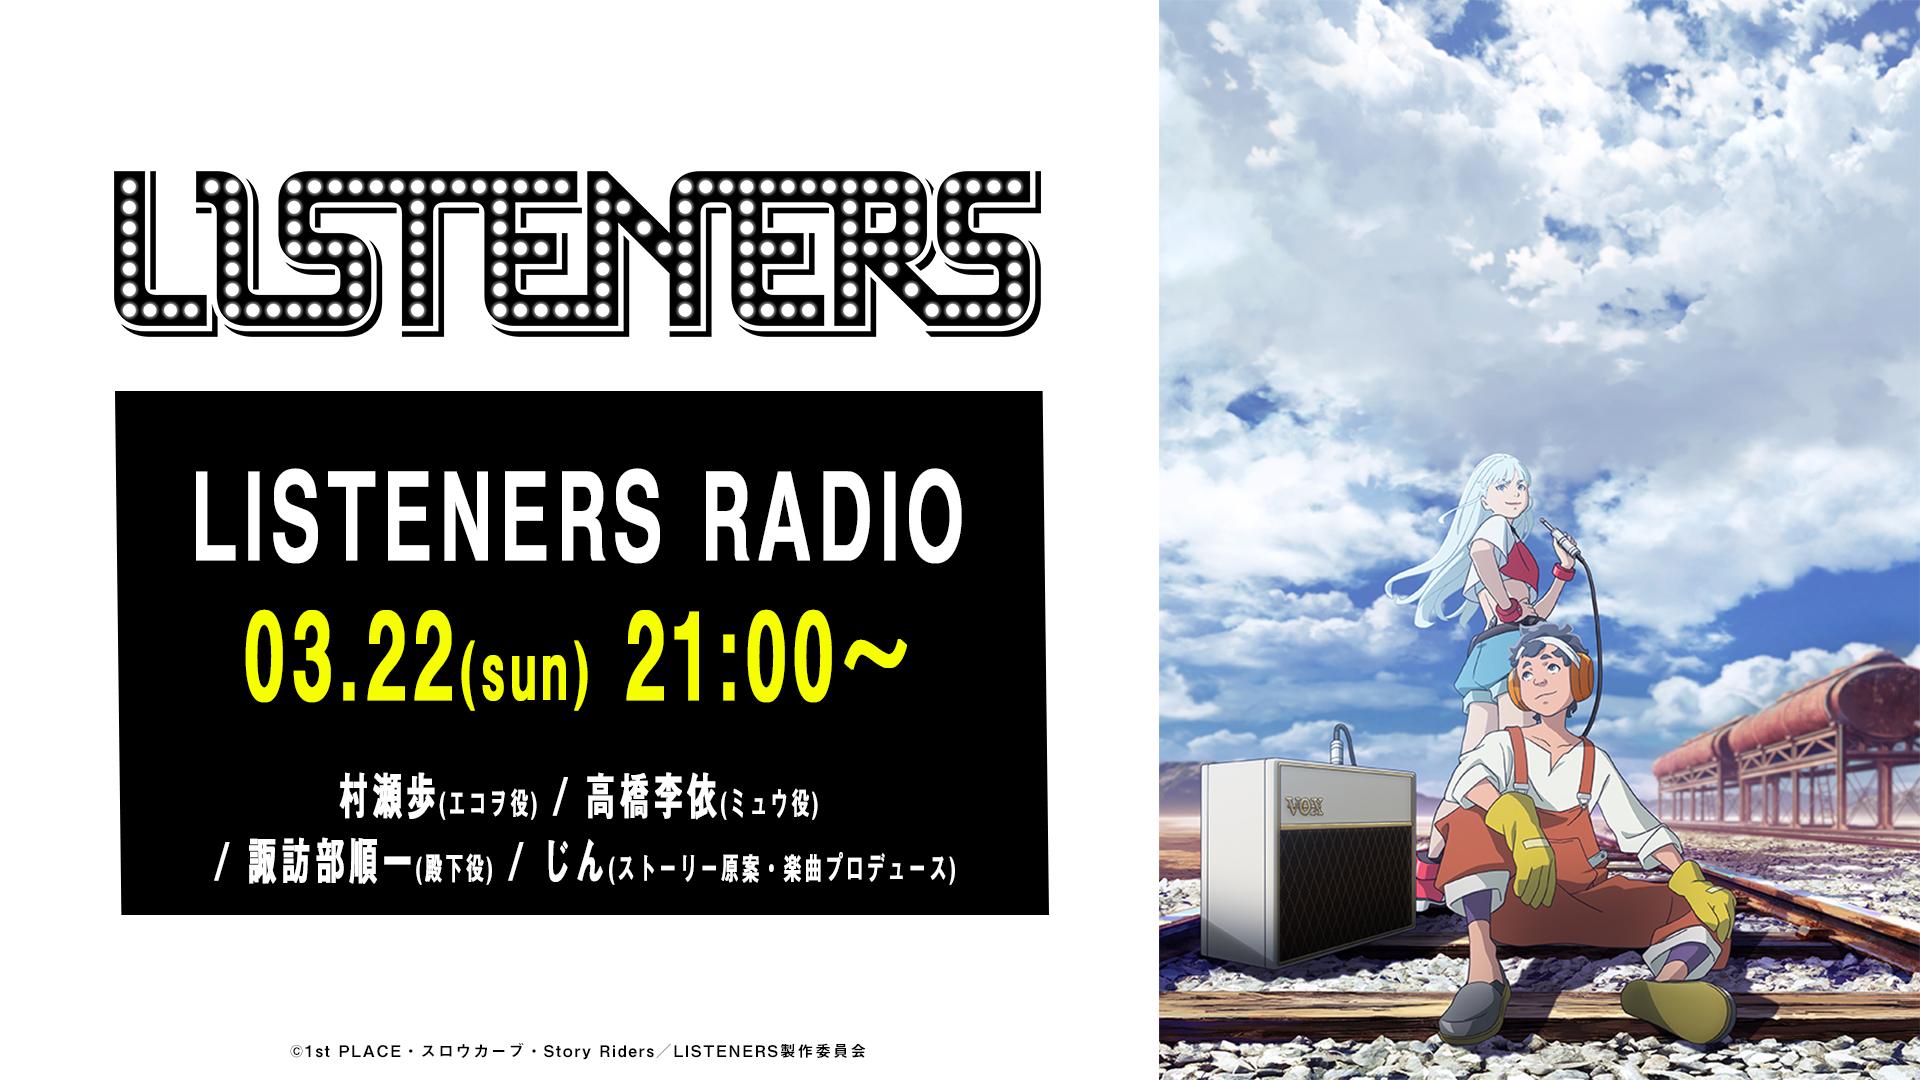 「LISTENERS ラジオ」 (C)1st PLACE・スロウカーブ・Story Riders/LISTENERS製作委員会